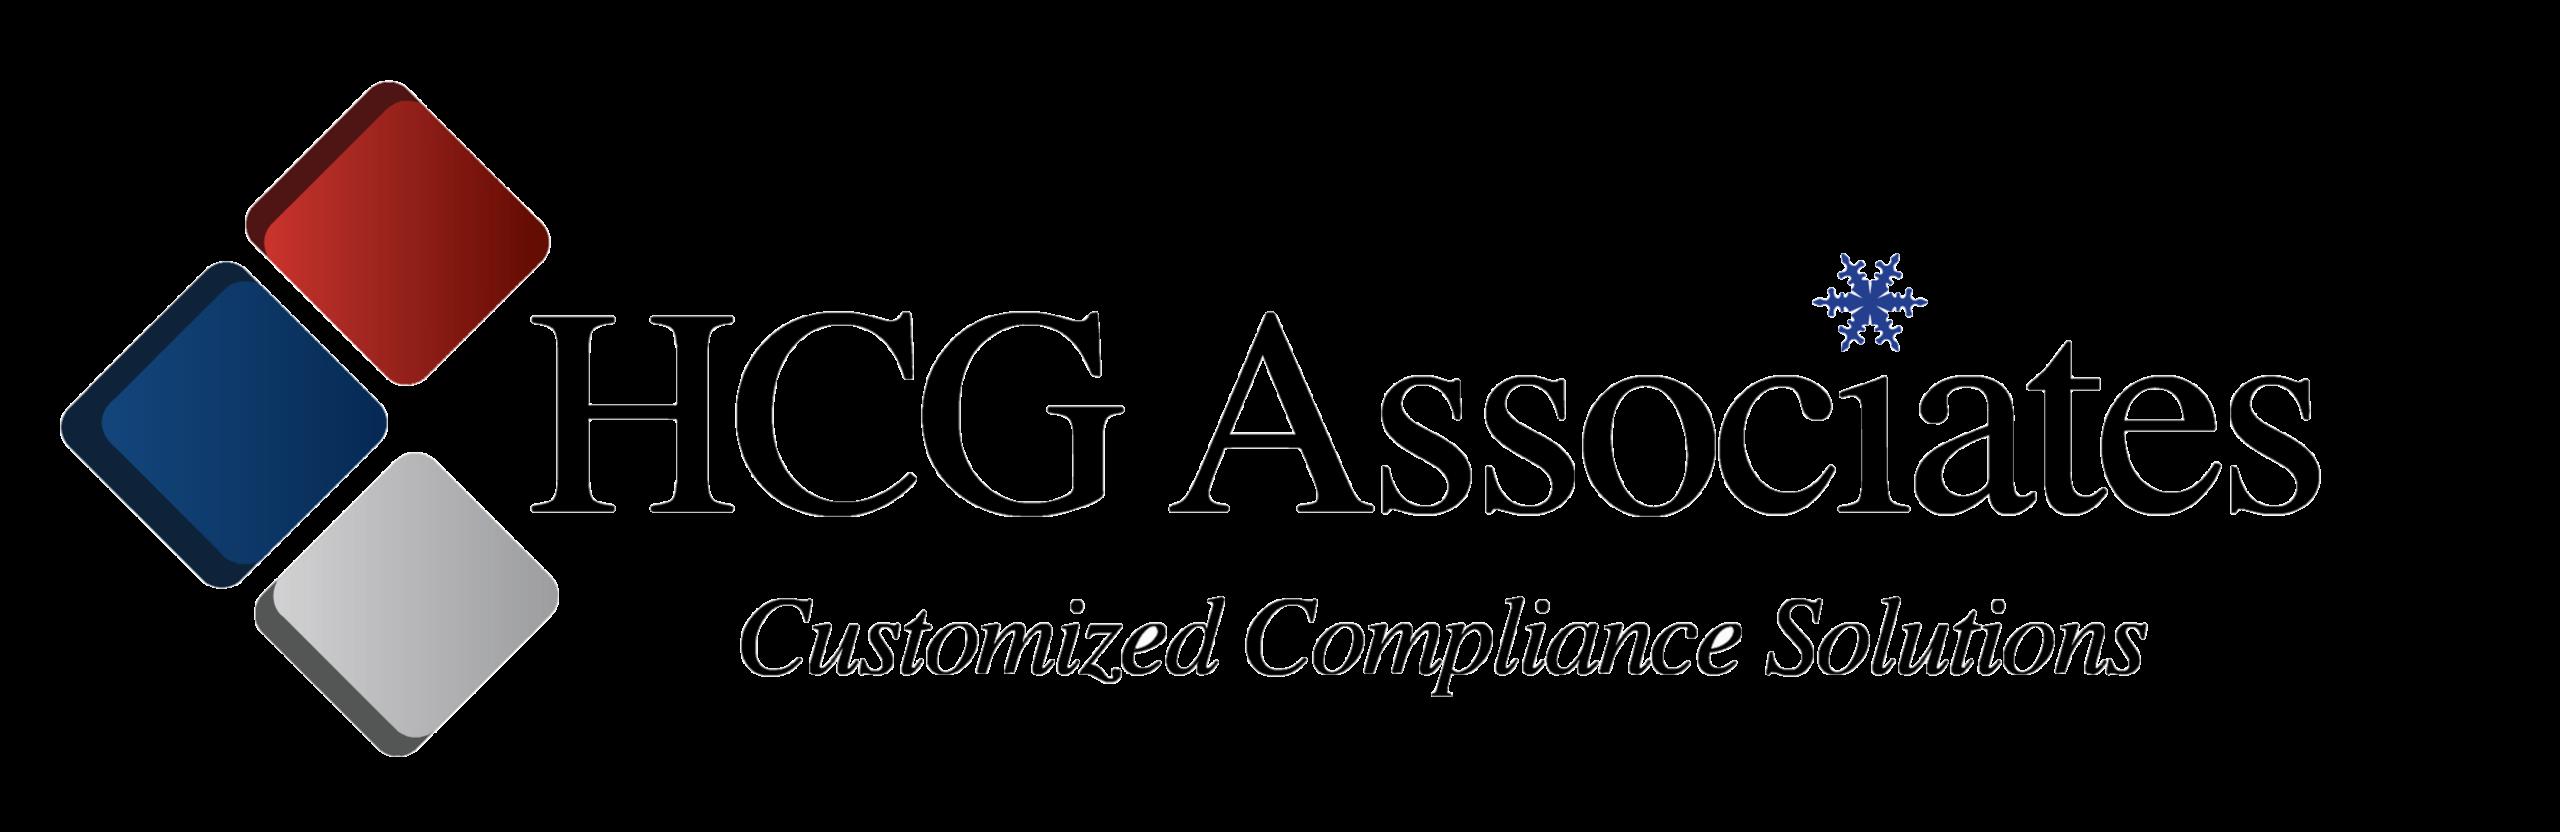 HCG Associates